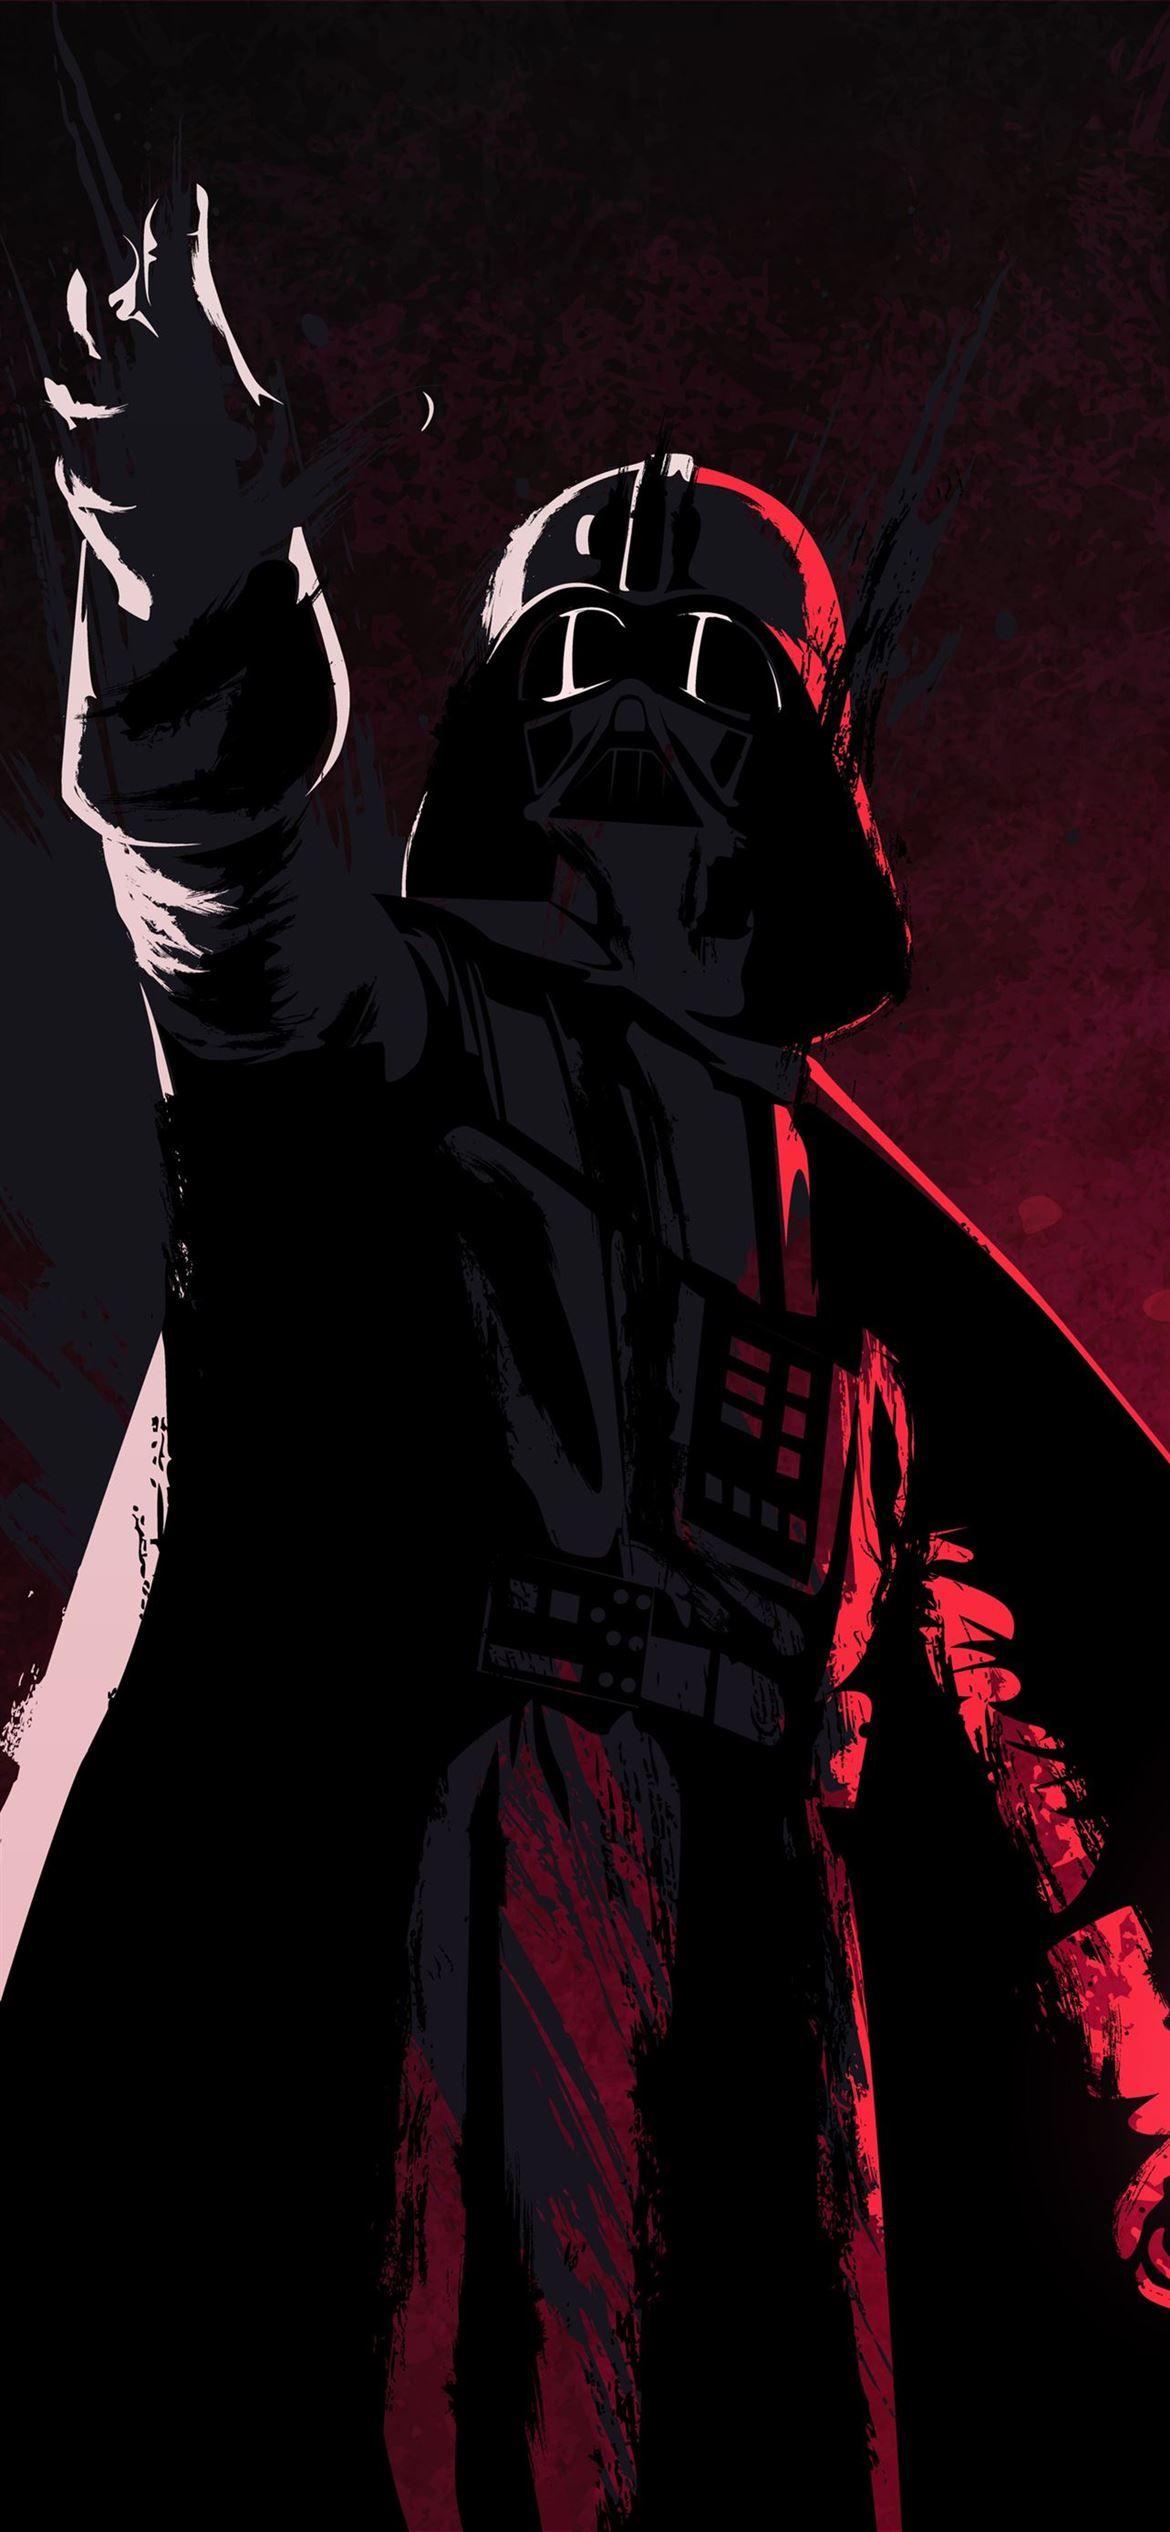 8k Darth Vader Darthvader Movies Starwars 4k 5k 8k Darth Vader Wallpaper Iphone Darth Vader Wallpaper Iphone 11 Wallpaper